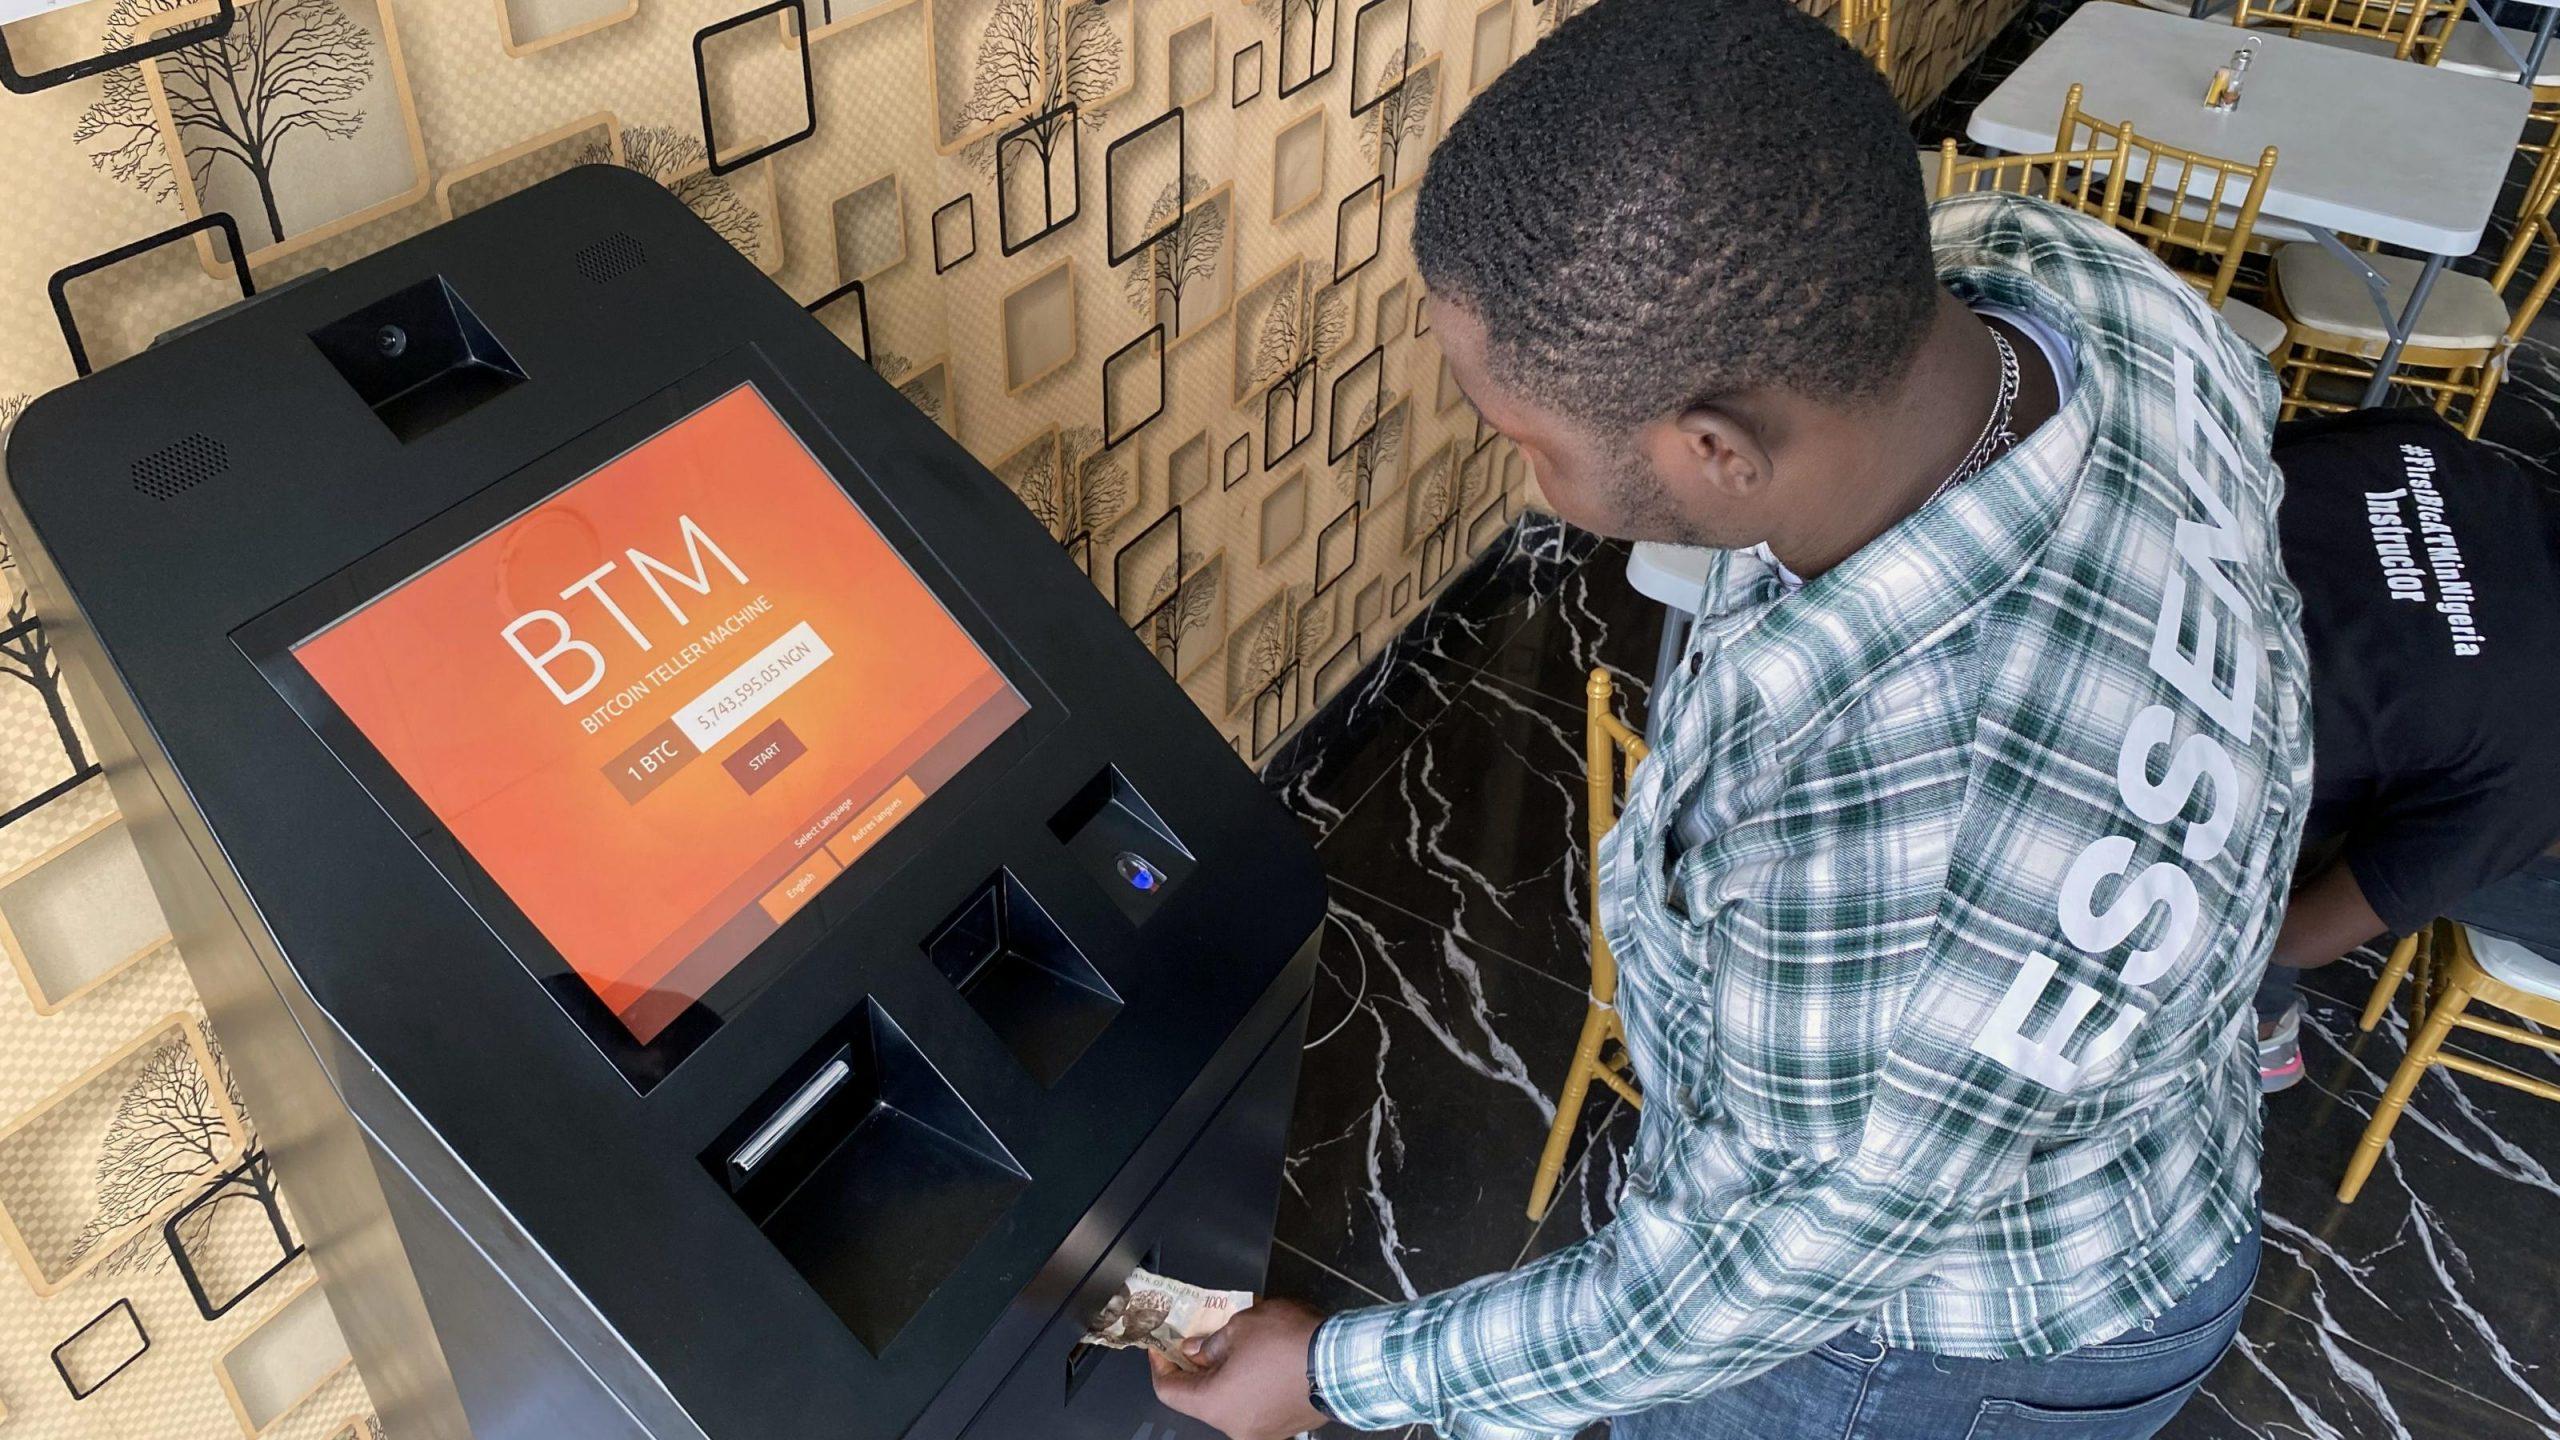 https://anysizedealsweek.com/wp-content/uploads/2020/12/Bitcoin-Nigeria-scaled.jpg